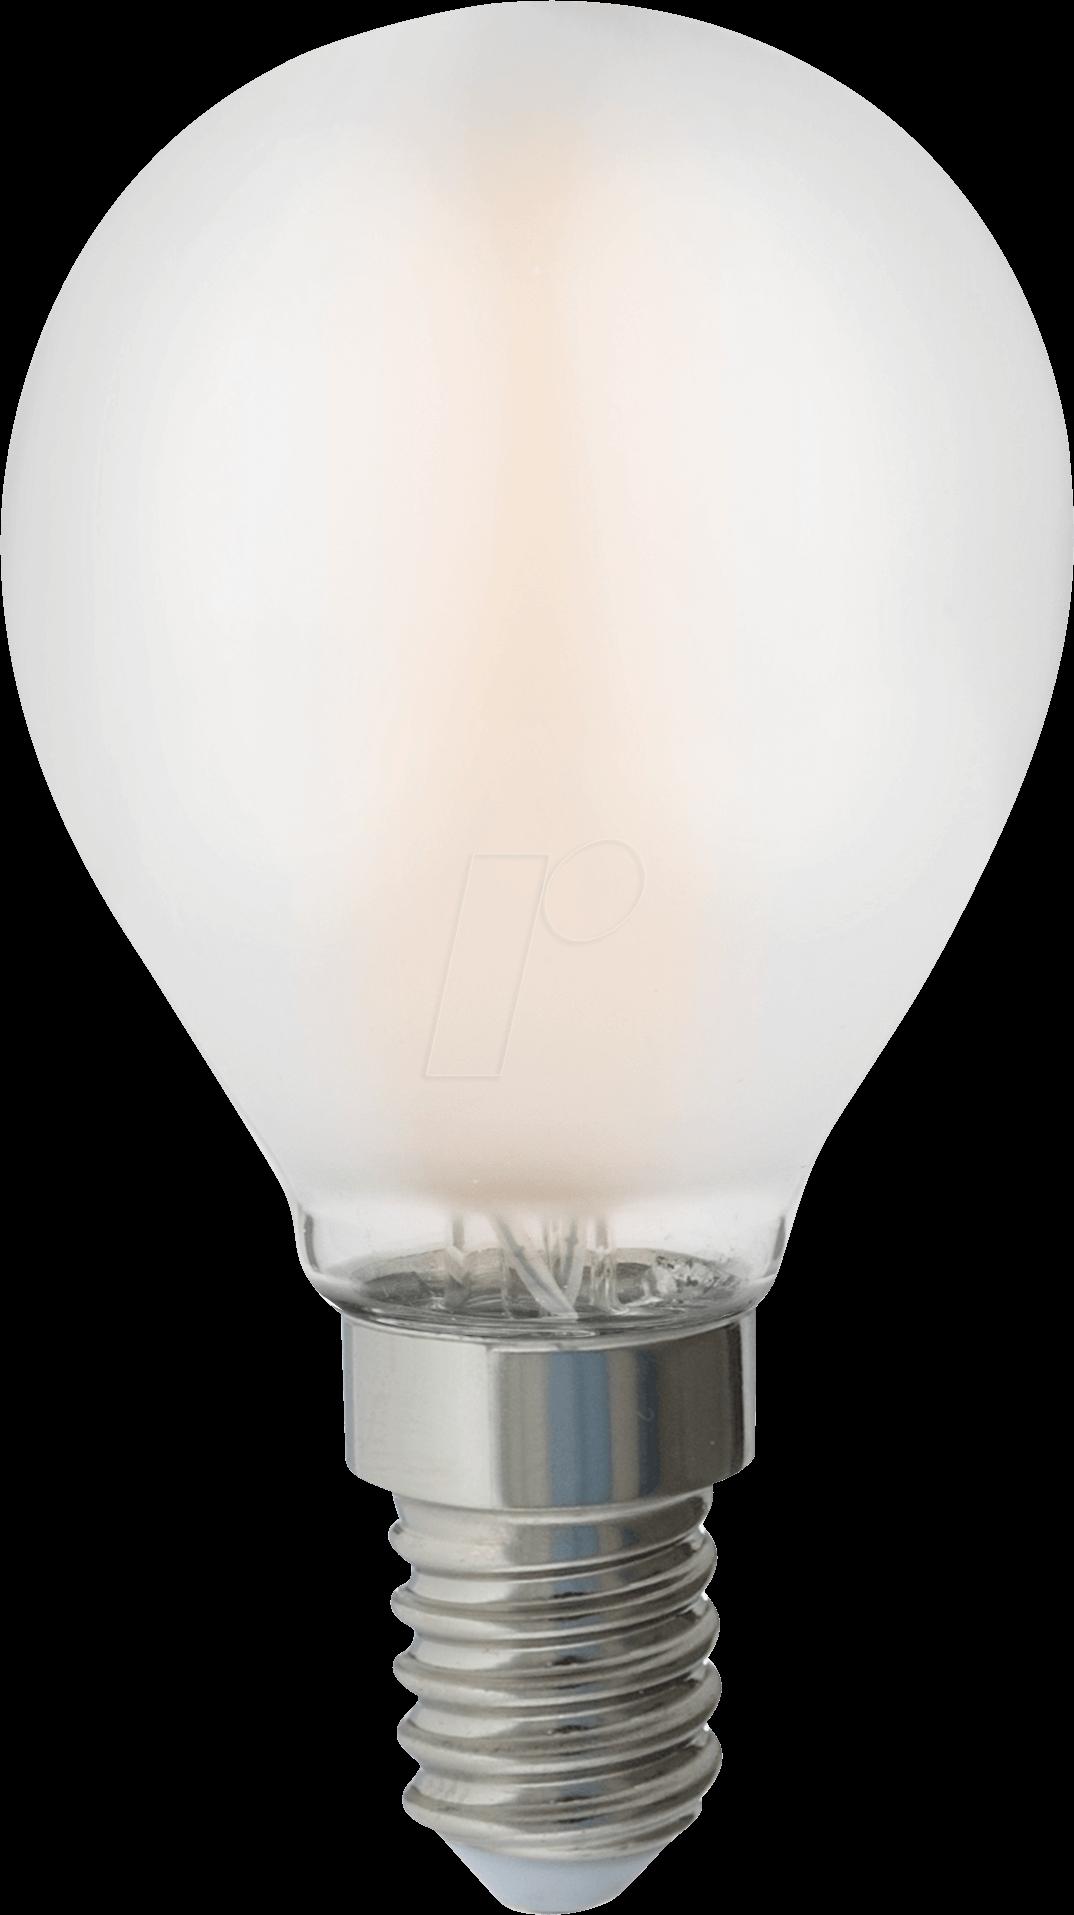 Gl 3814 Led Lampe E14 4 W 415 Lm 2700 K Filament Bei Reichelt